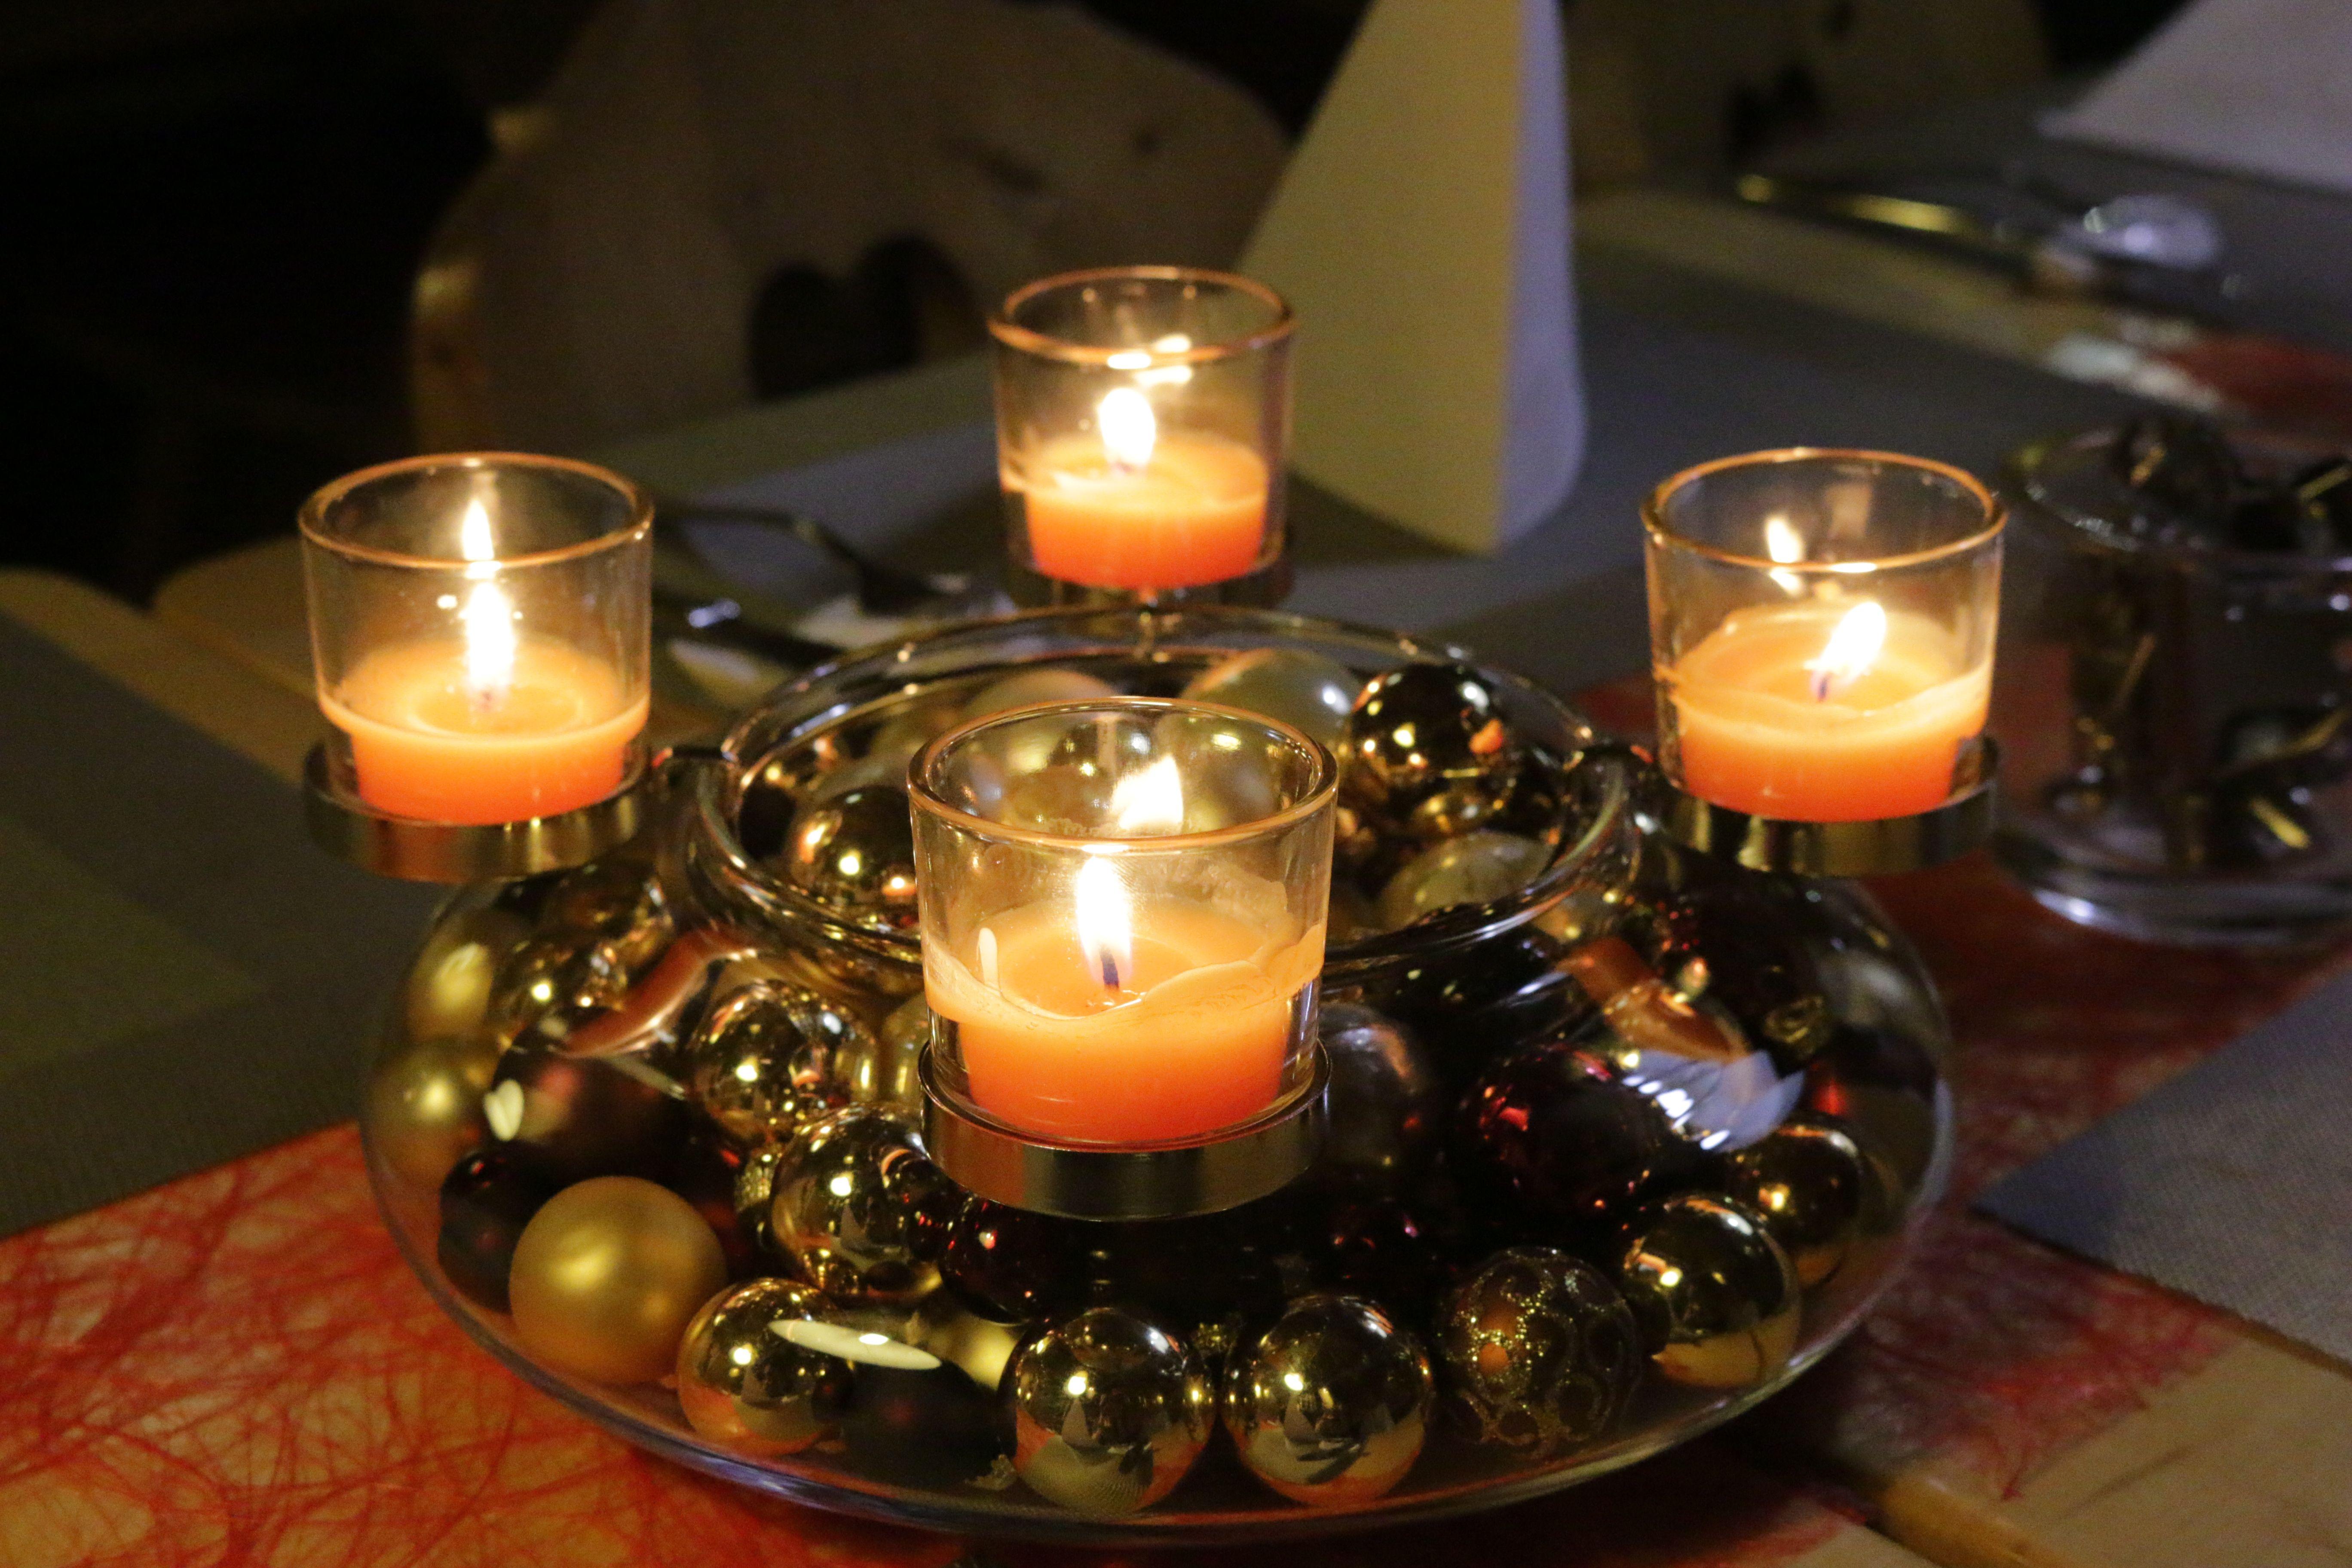 adventskranz deko mit partylite kerzen ideen glas. Black Bedroom Furniture Sets. Home Design Ideas